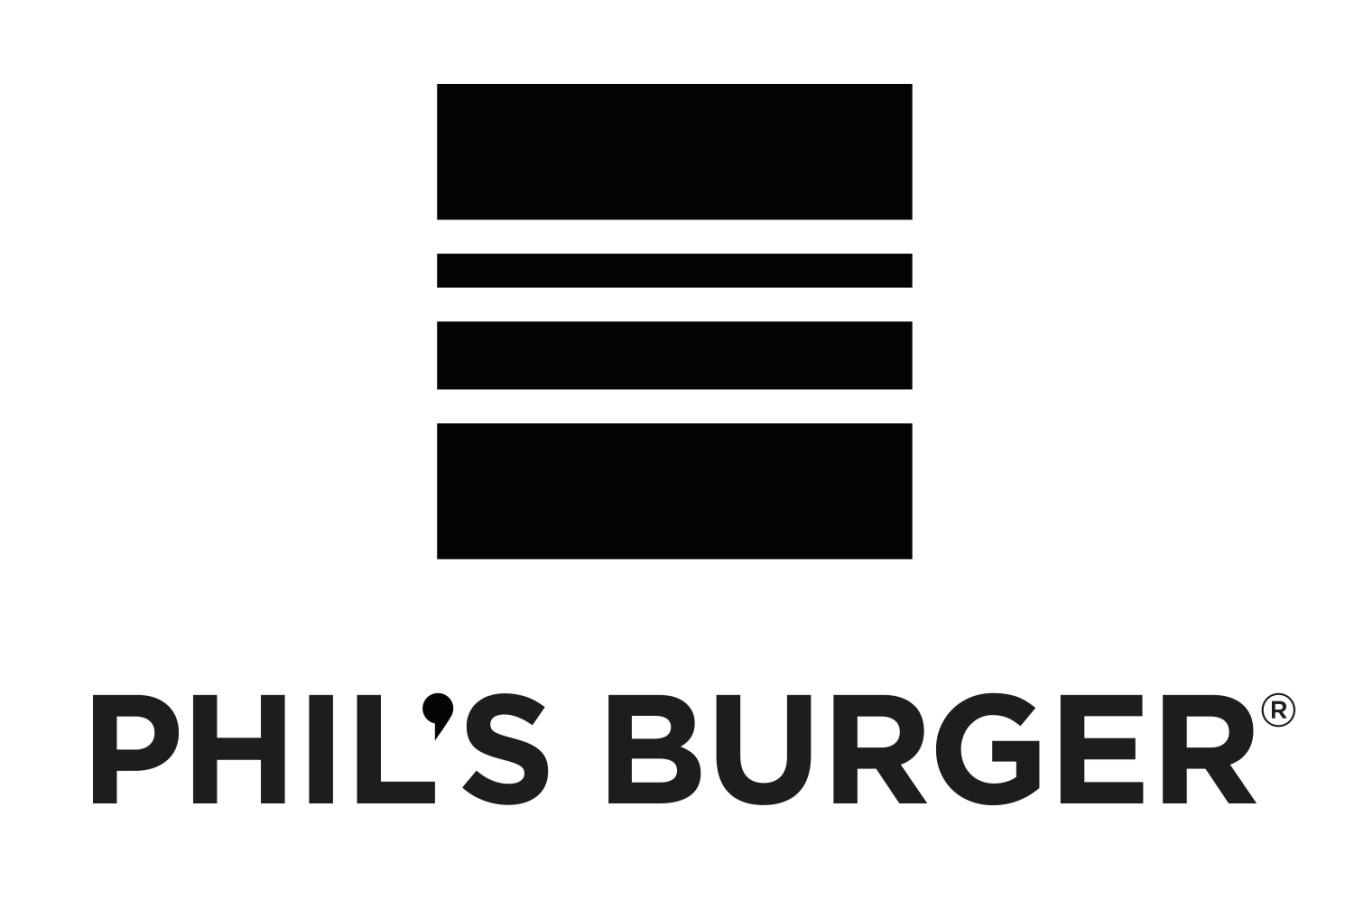 phils burger1